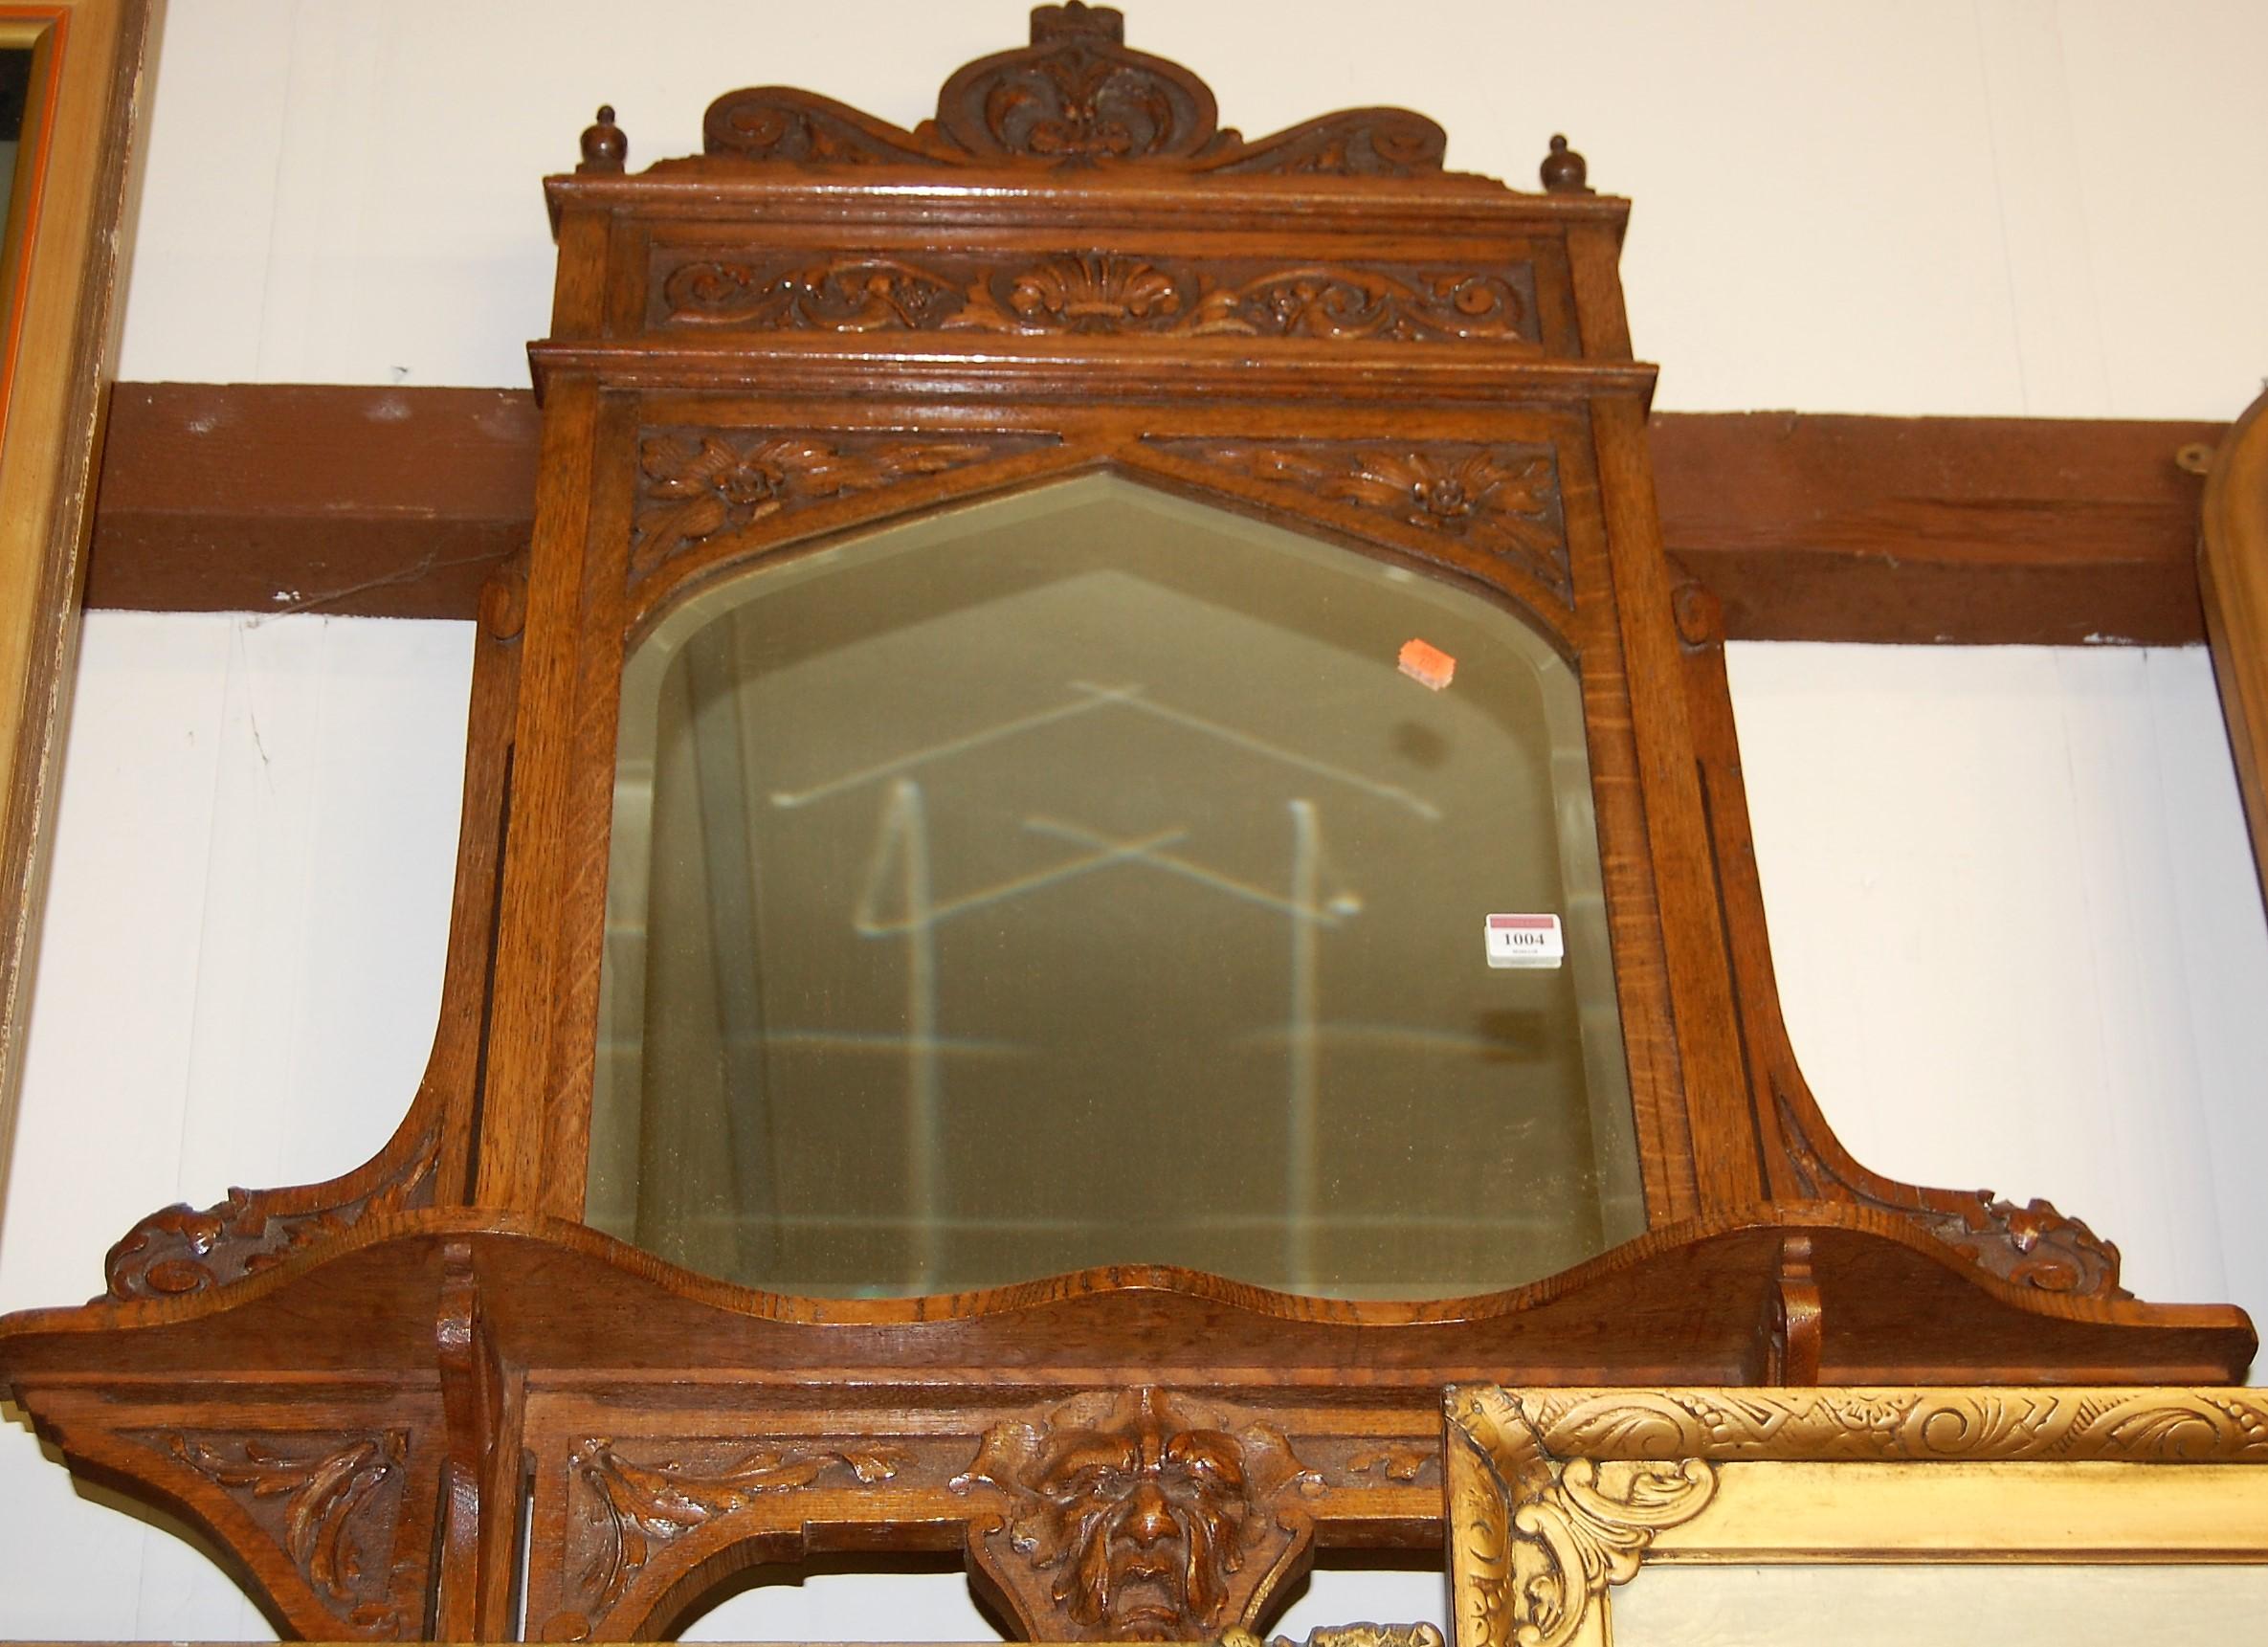 Lot 1004 - A circa 1900 carved oak wall mirror, 97 x 88cm